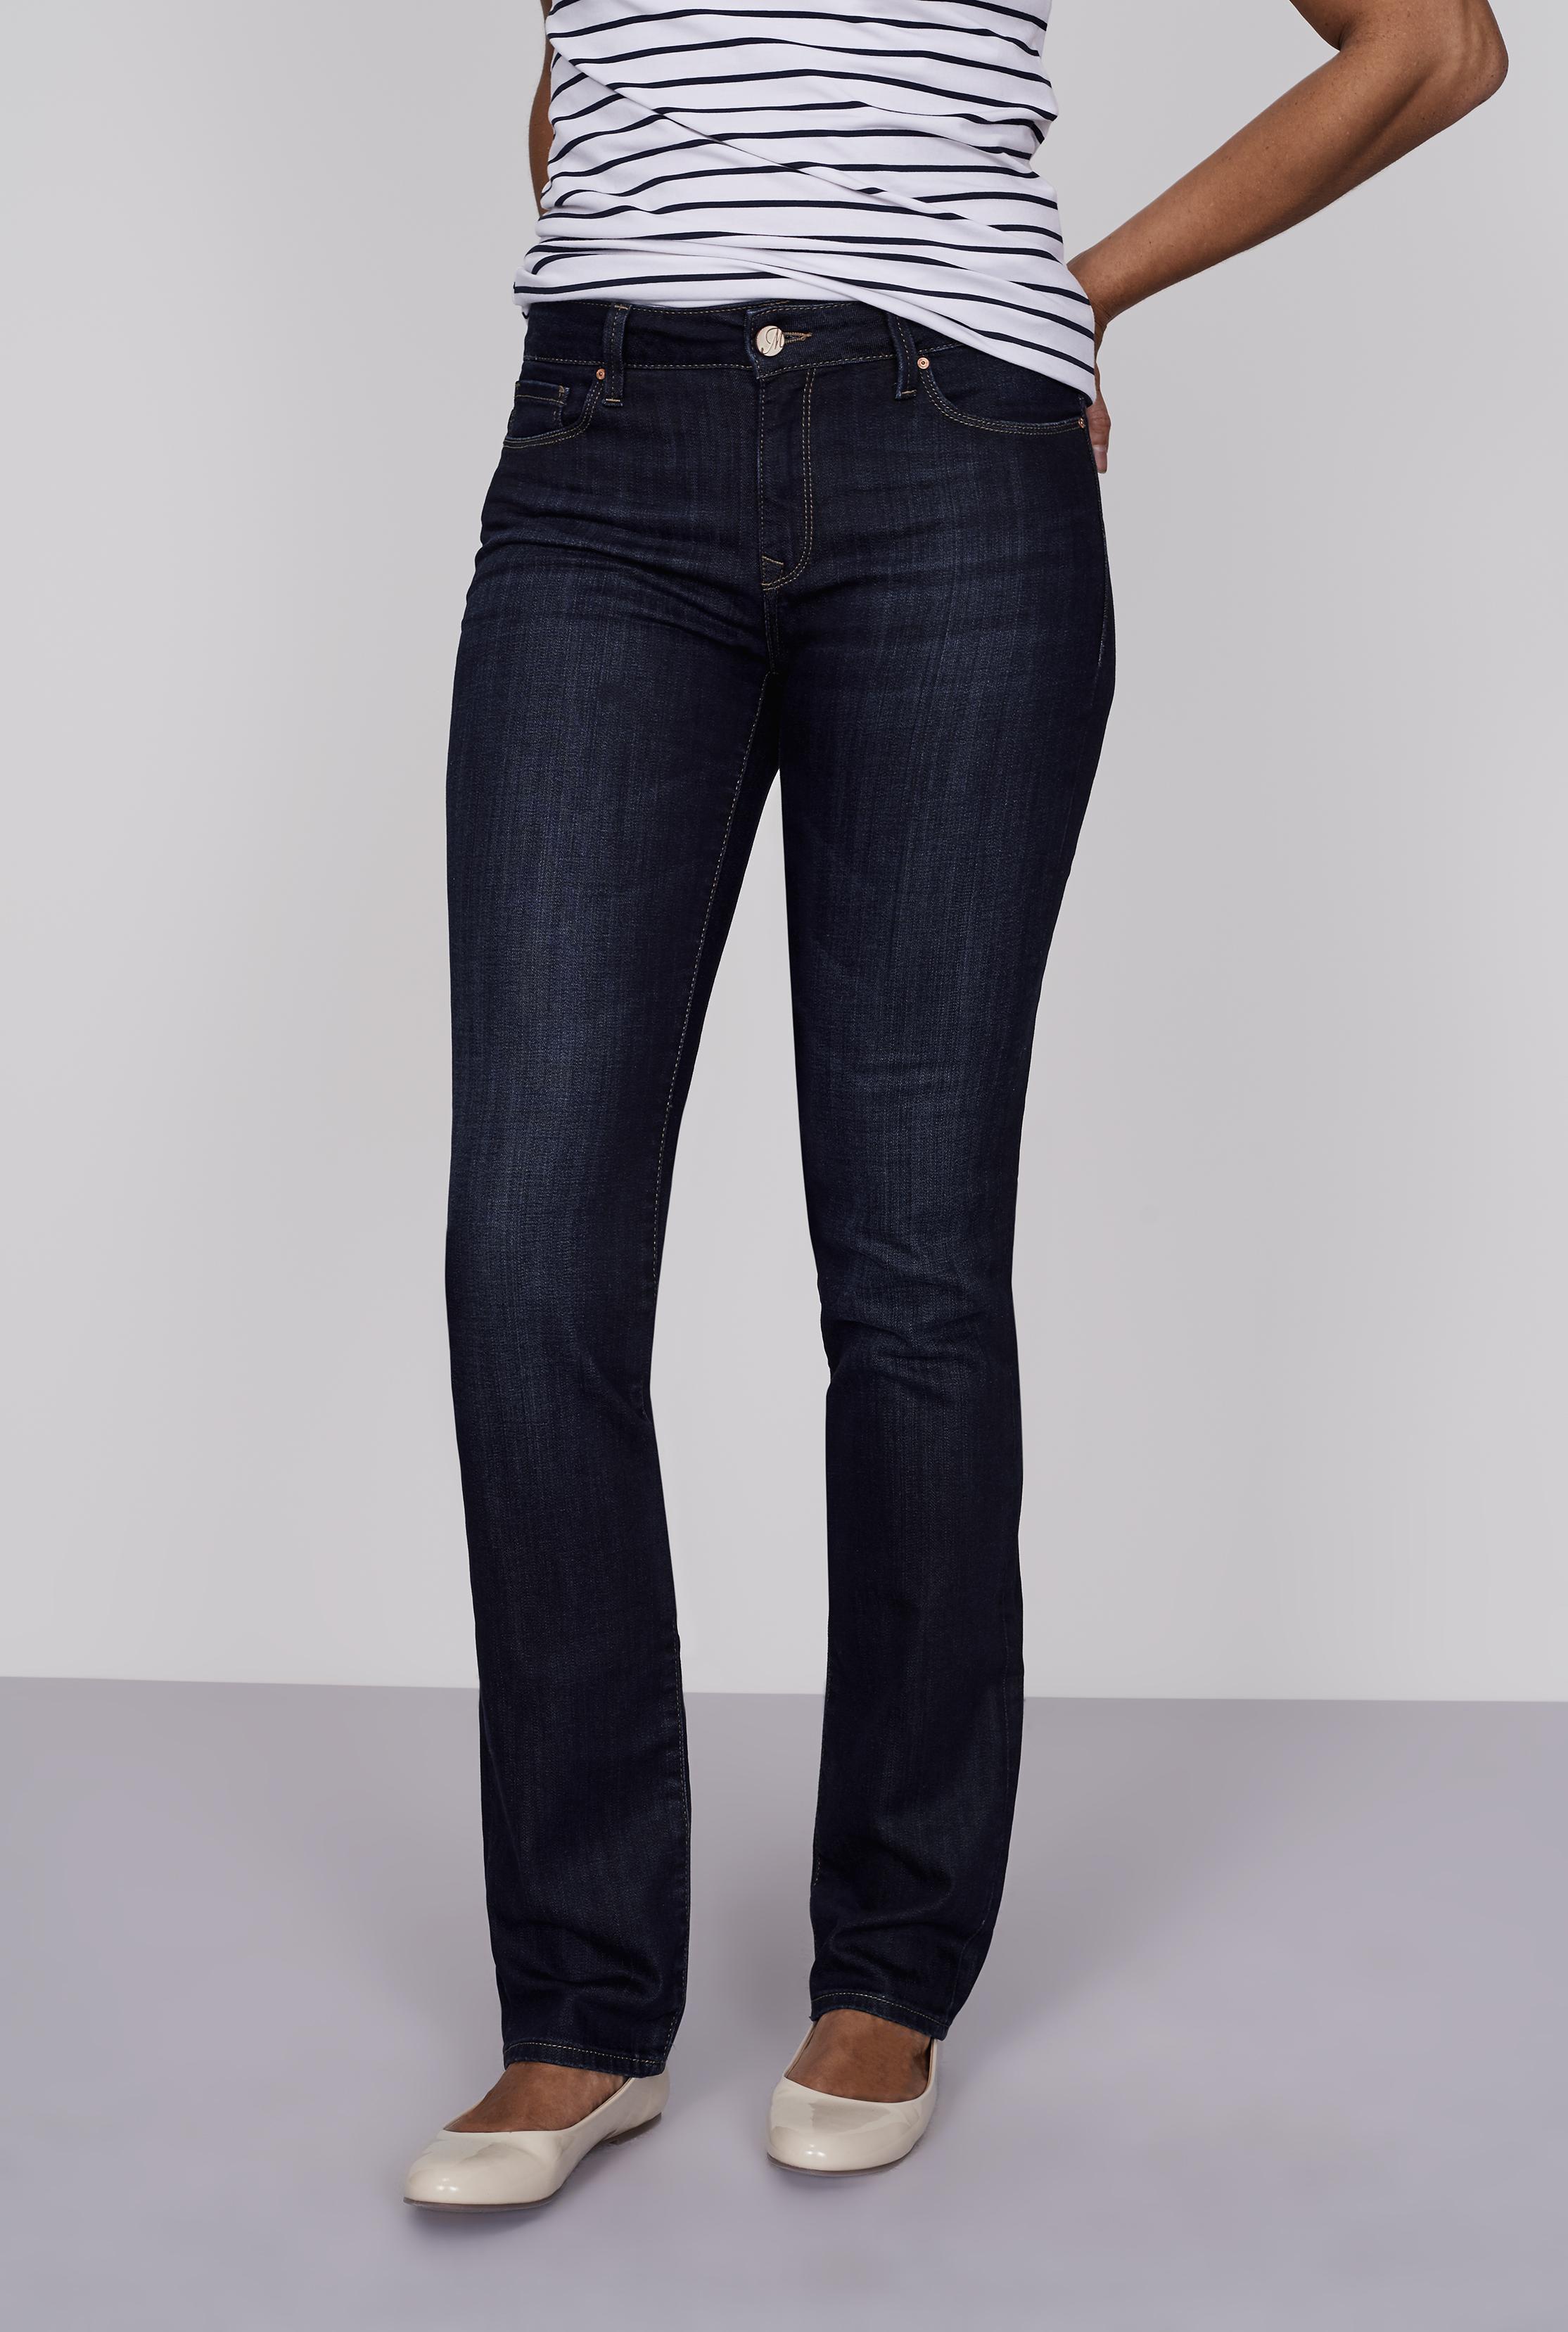 Mavi Kendra Straight Jeans